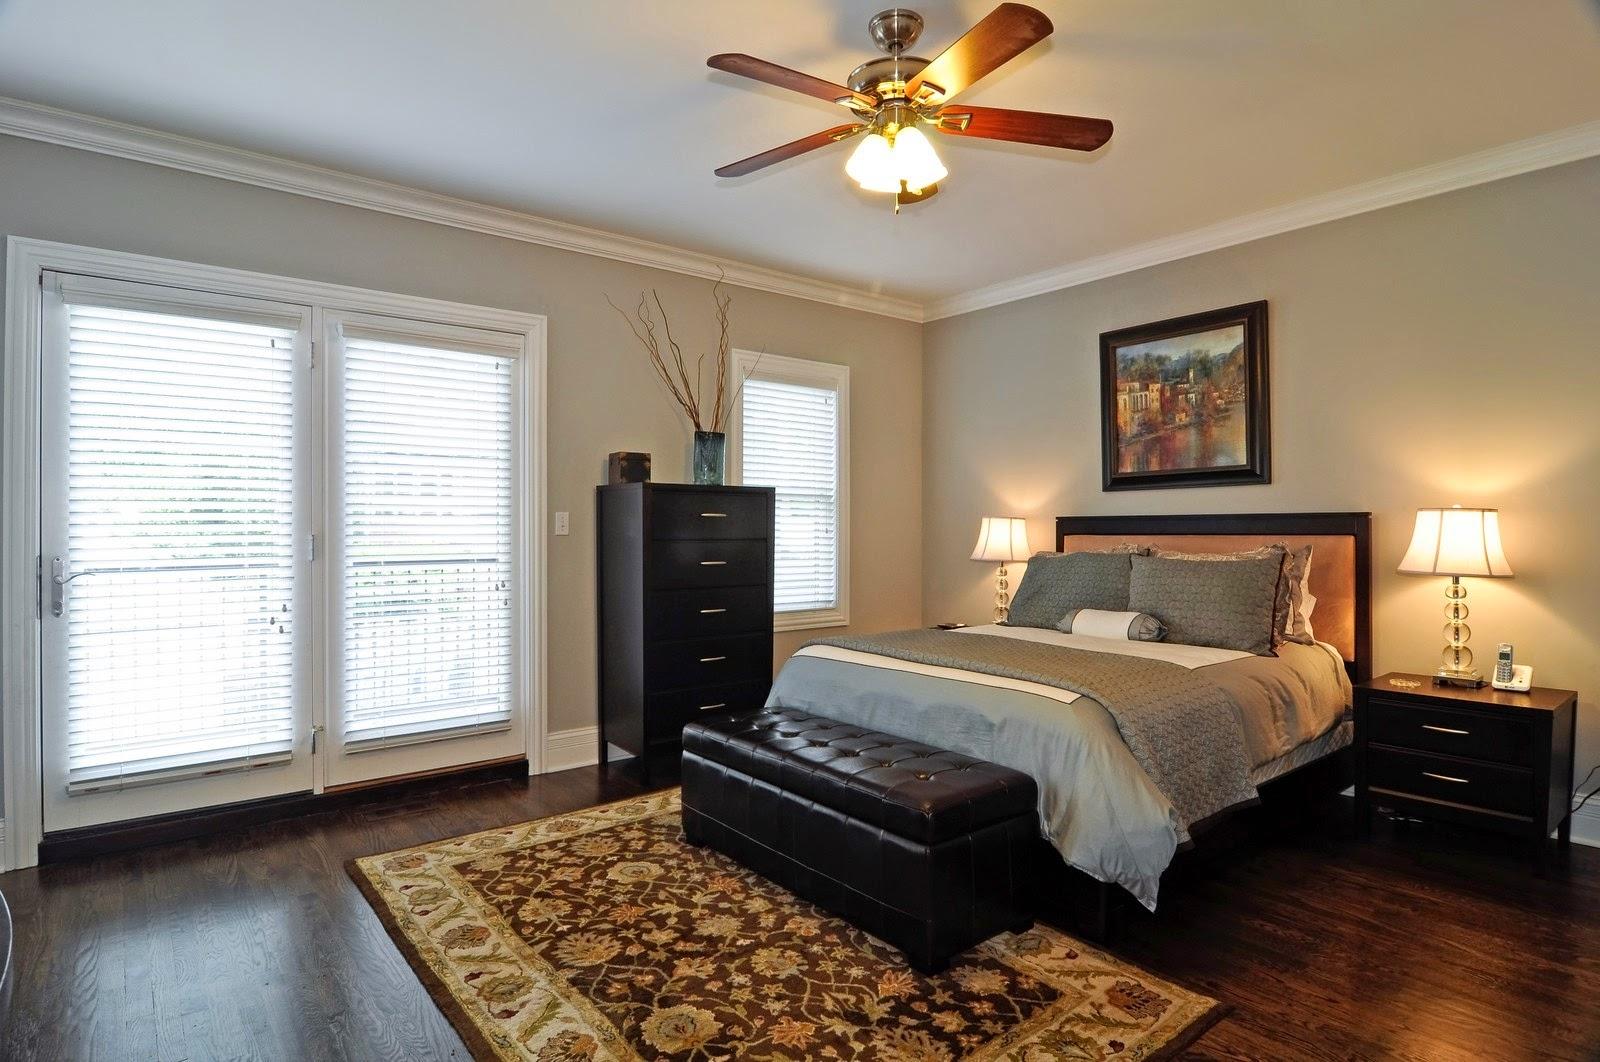 Master bedroom paint colors benjamin moore - Revere Pewter Benjamin Moore